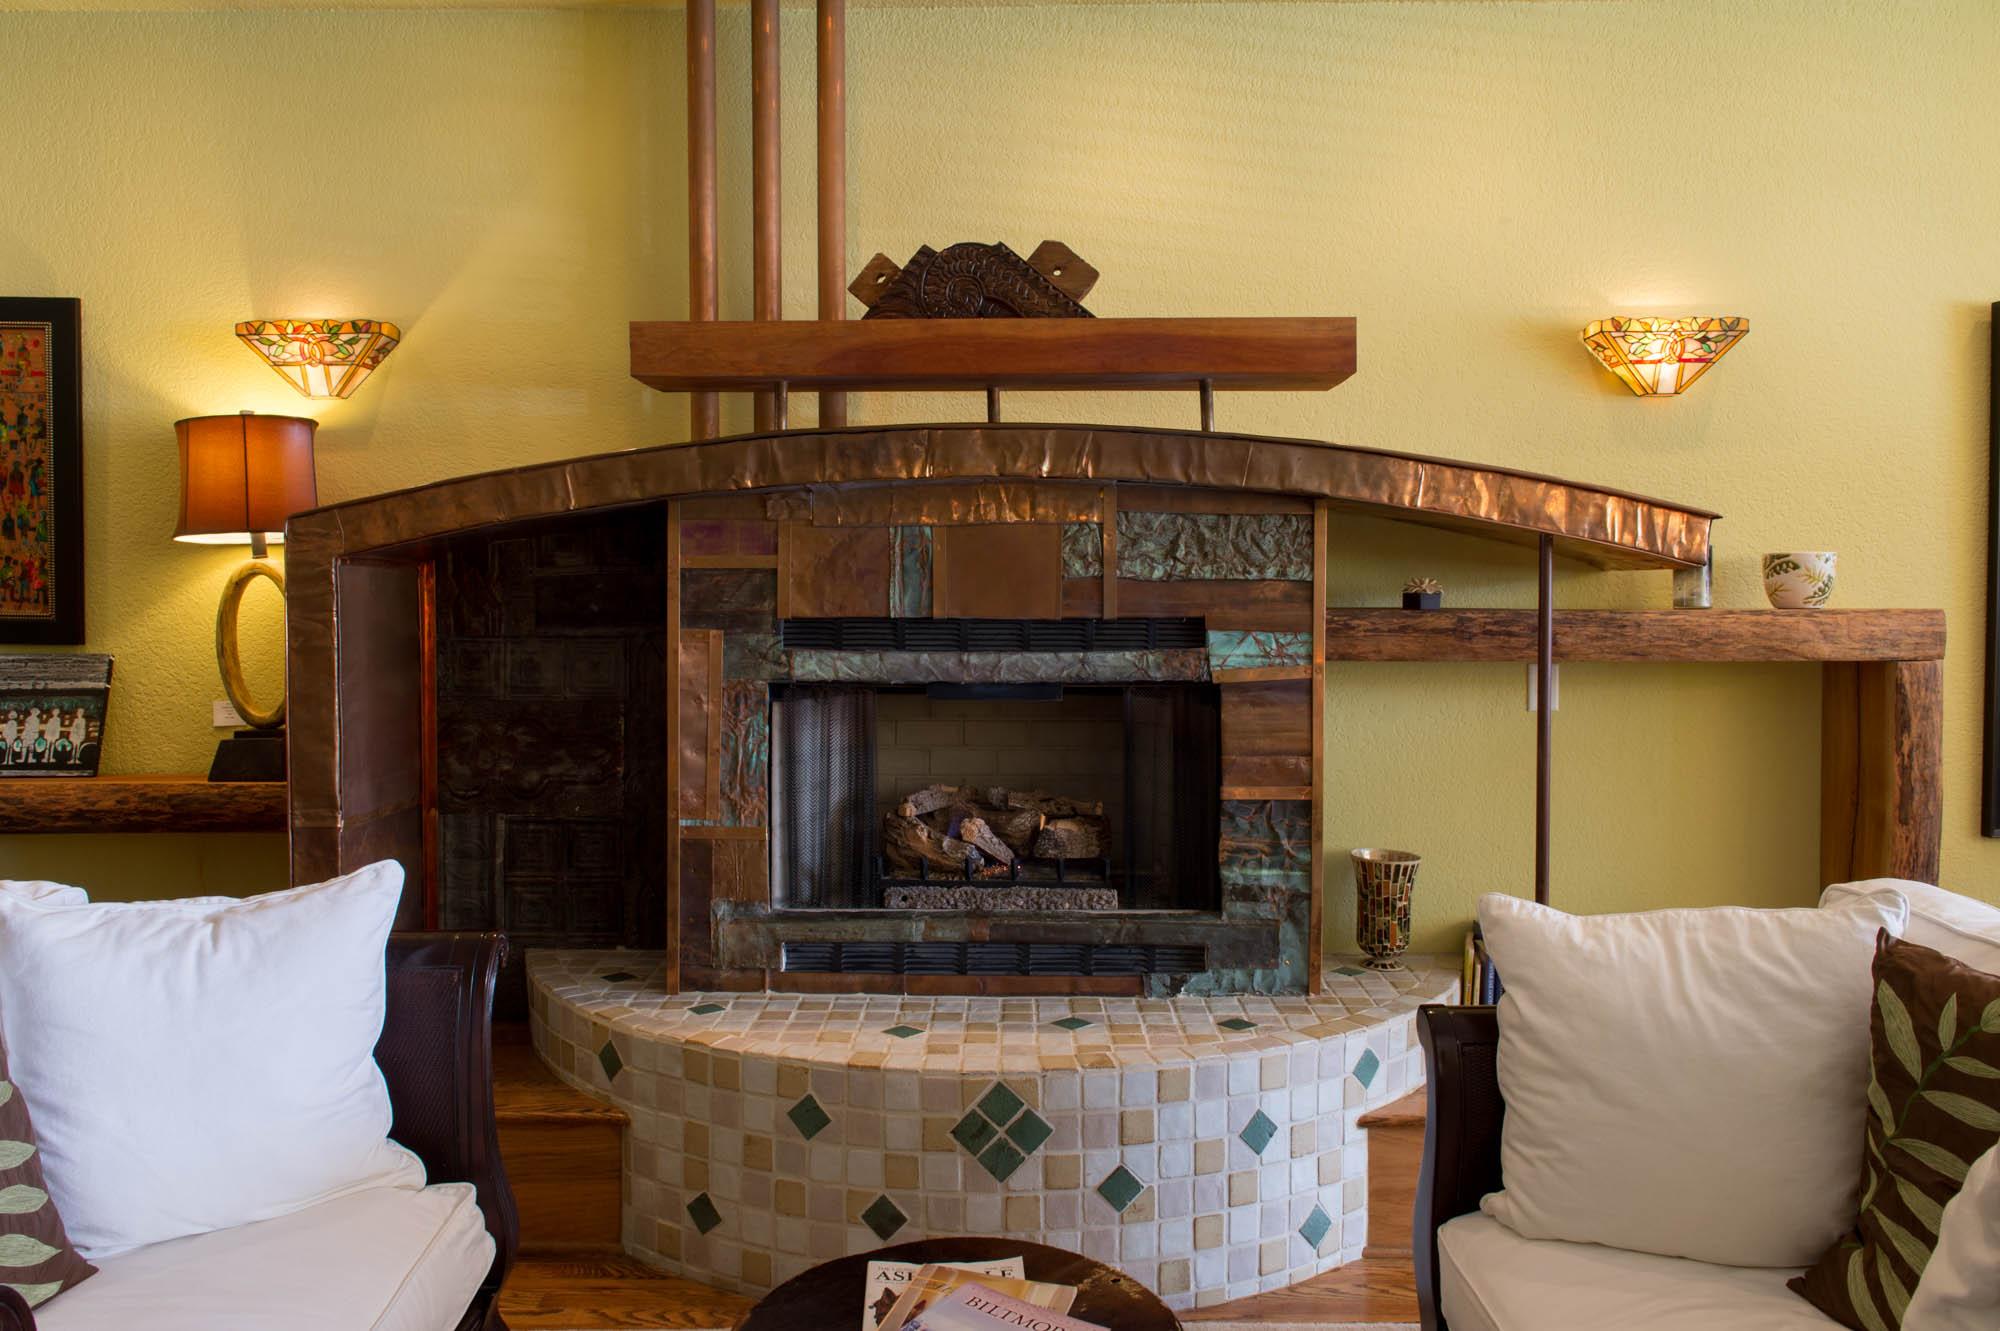 Custom Copper Surround Fireplace